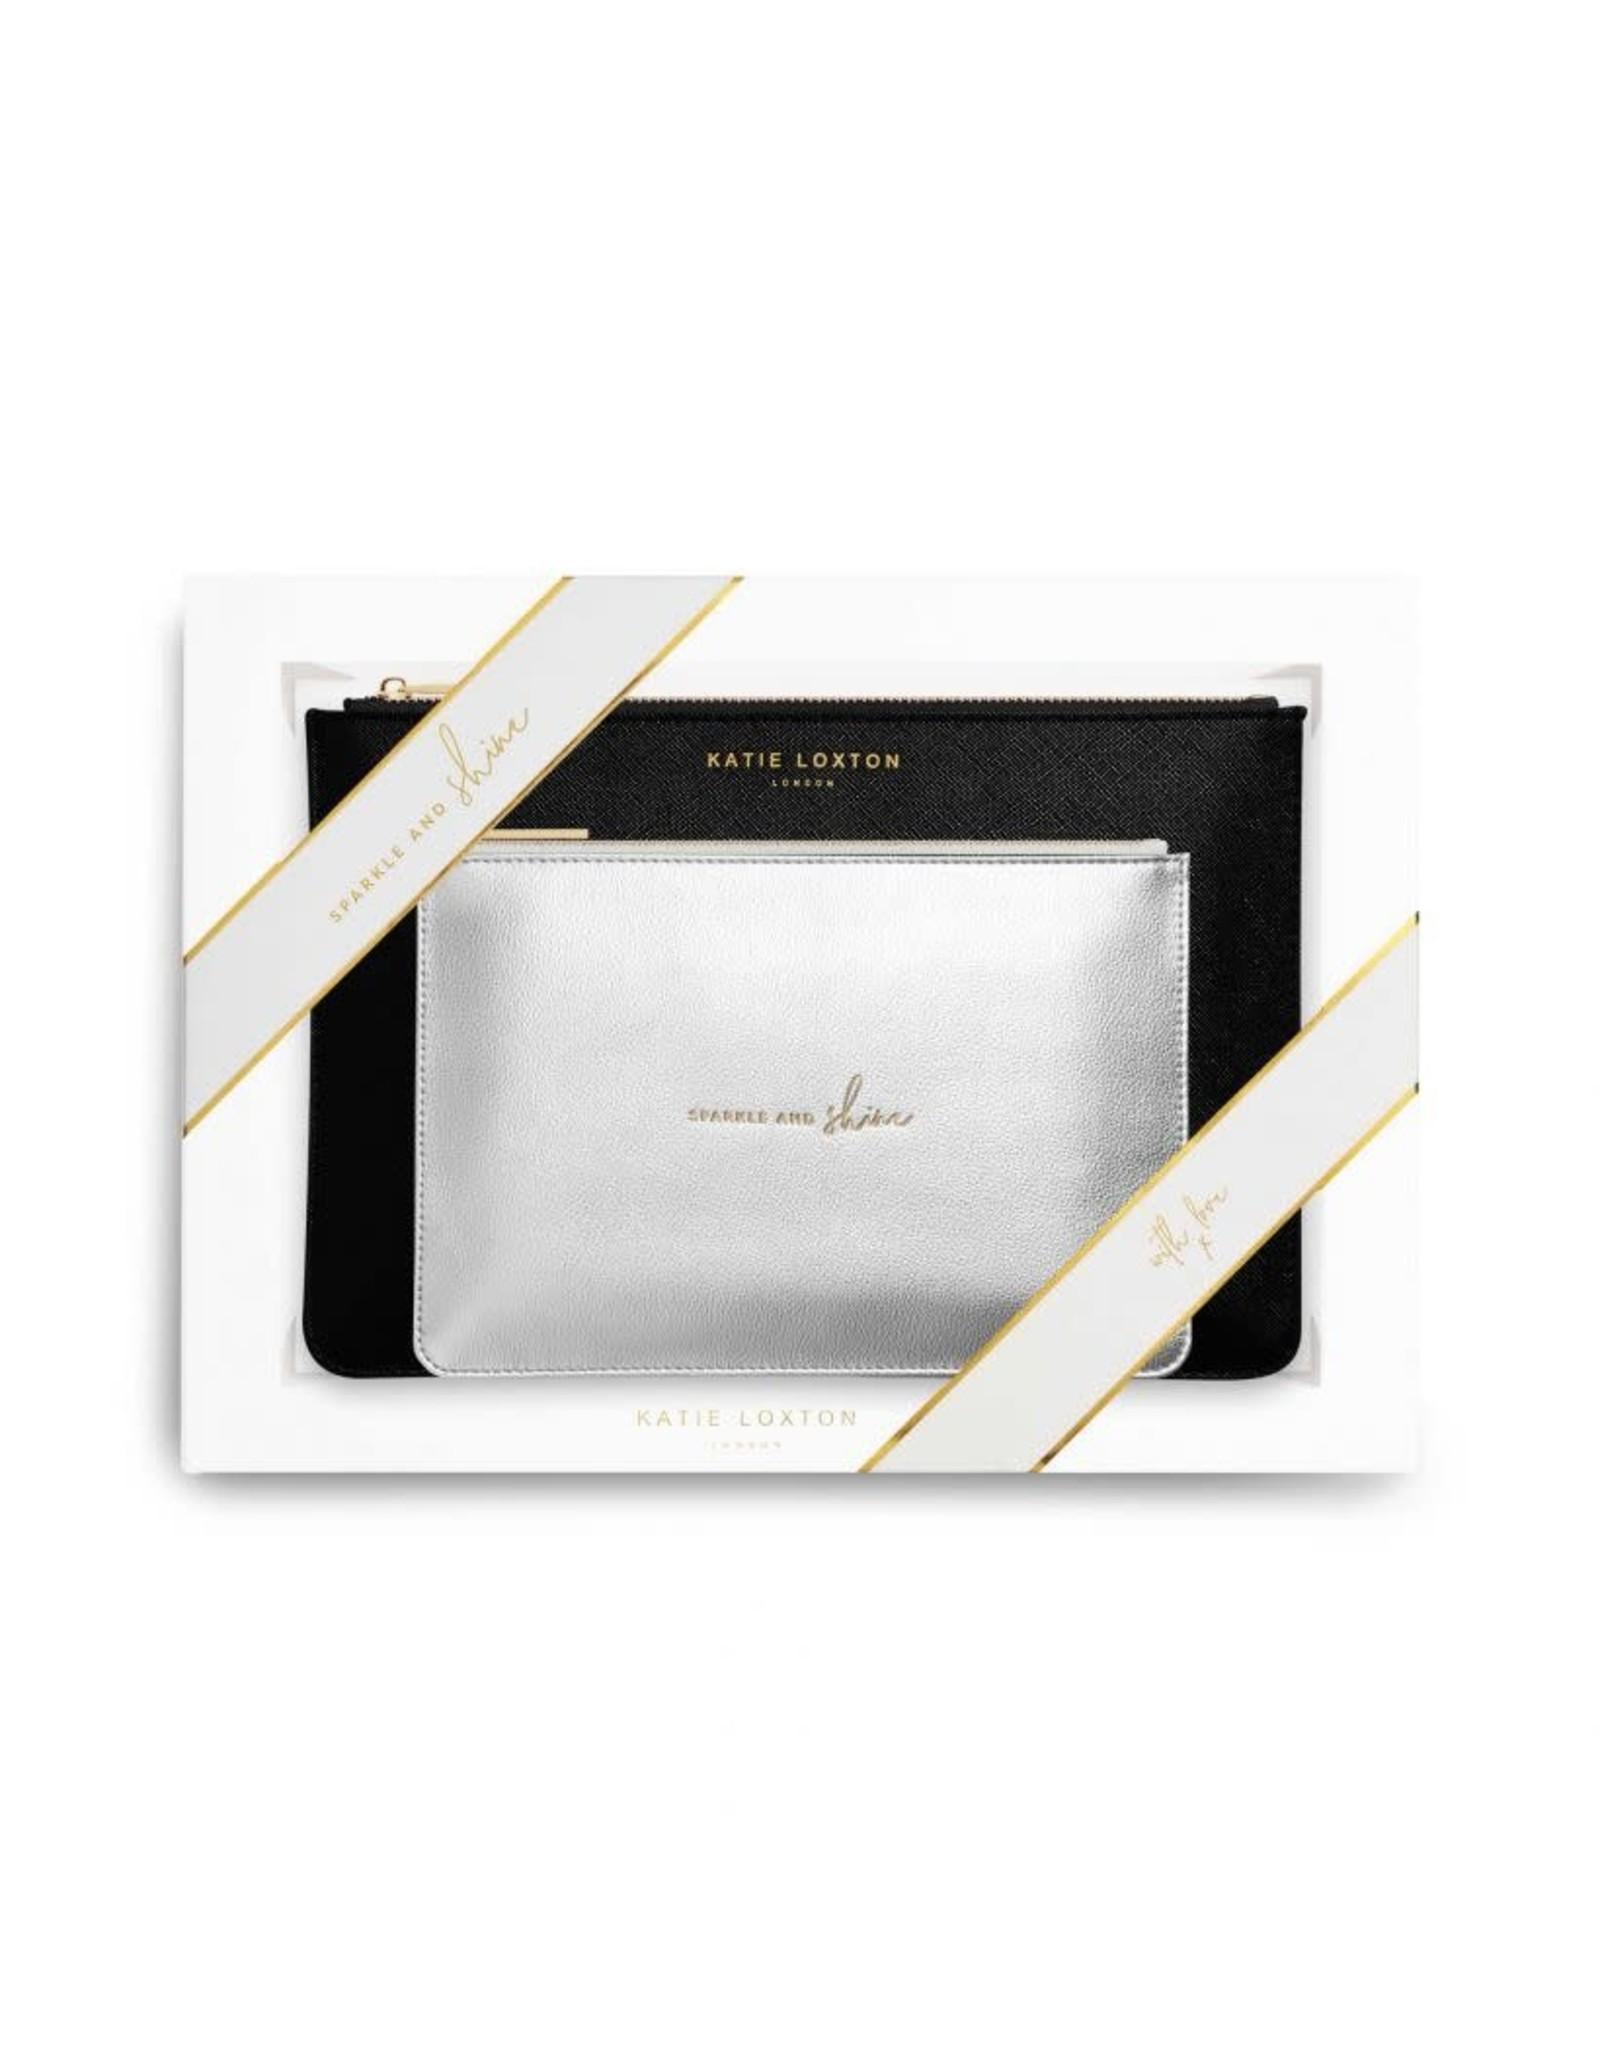 Katie Loxton Perfect Pouch Giftset - Sparkle & Shine